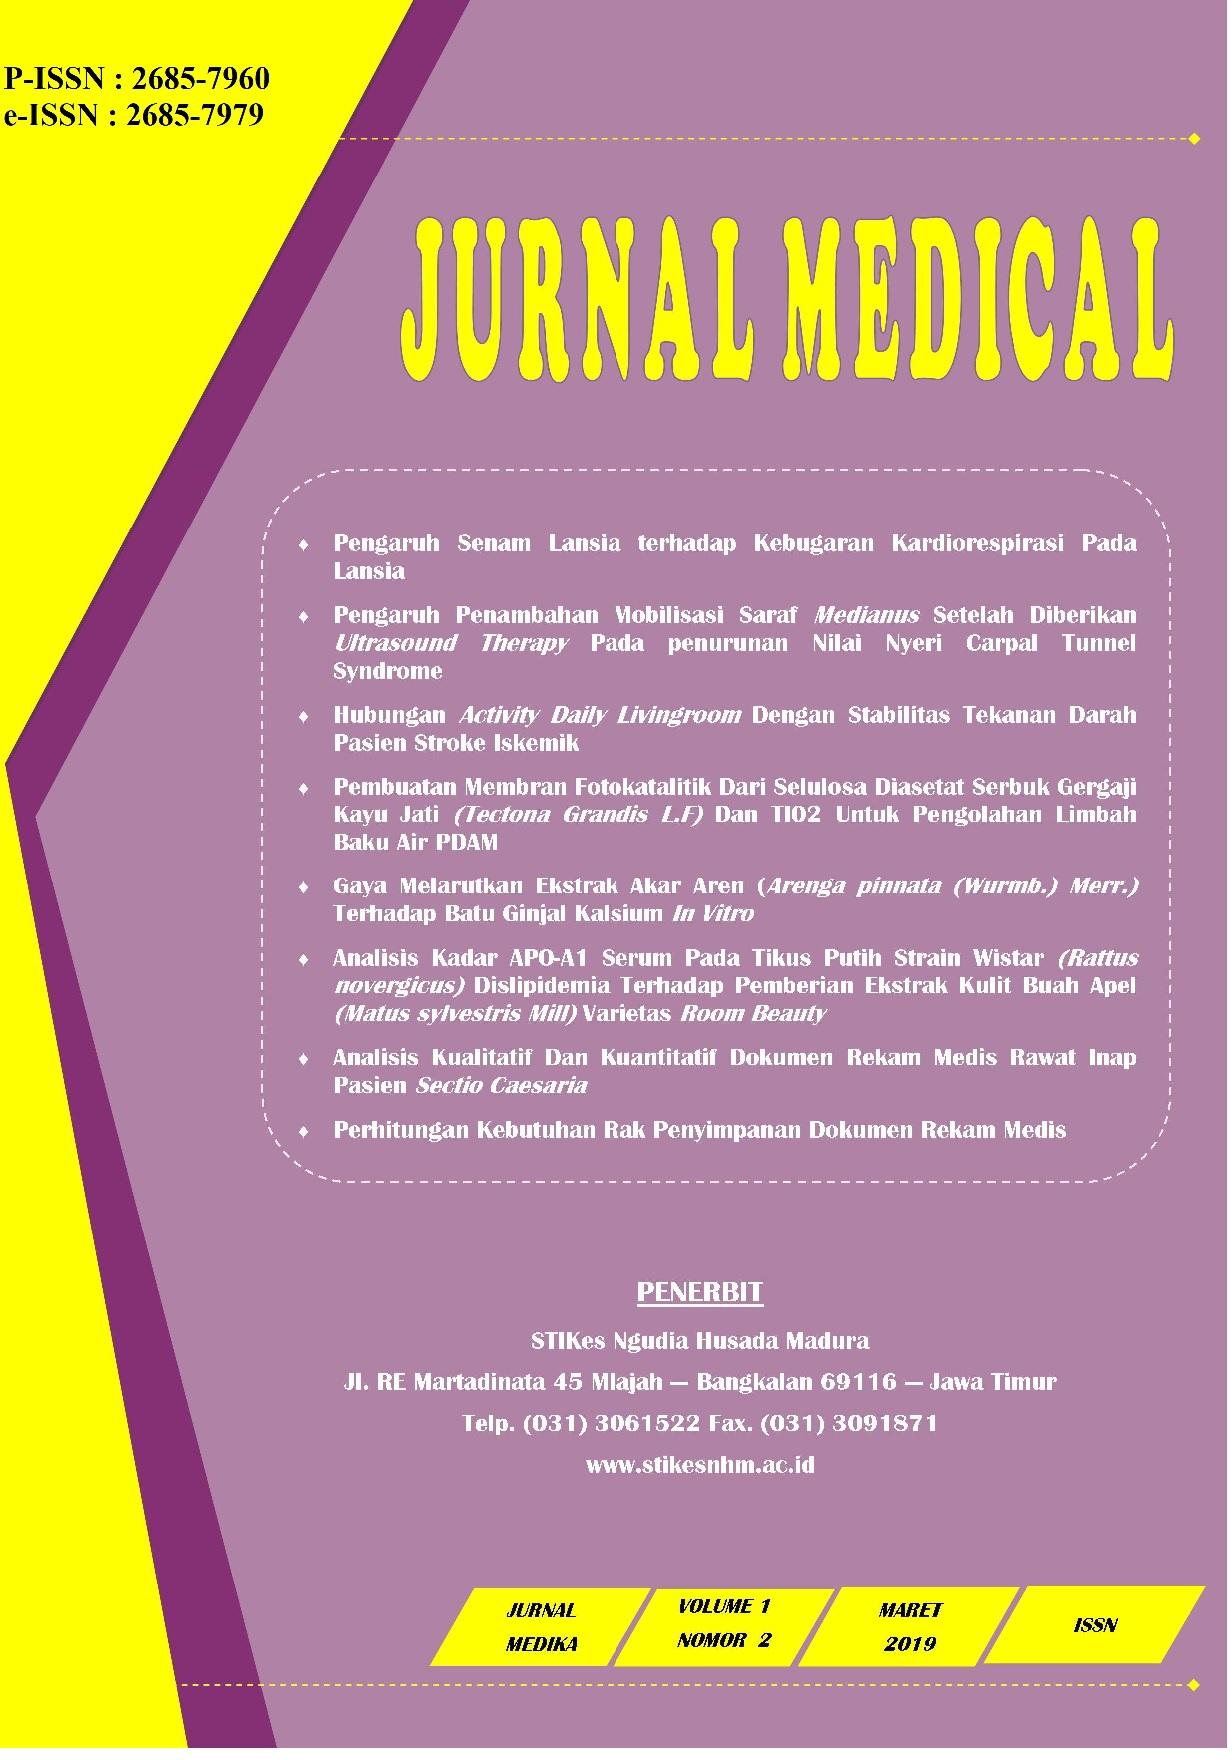 JURNAL MEDICAL